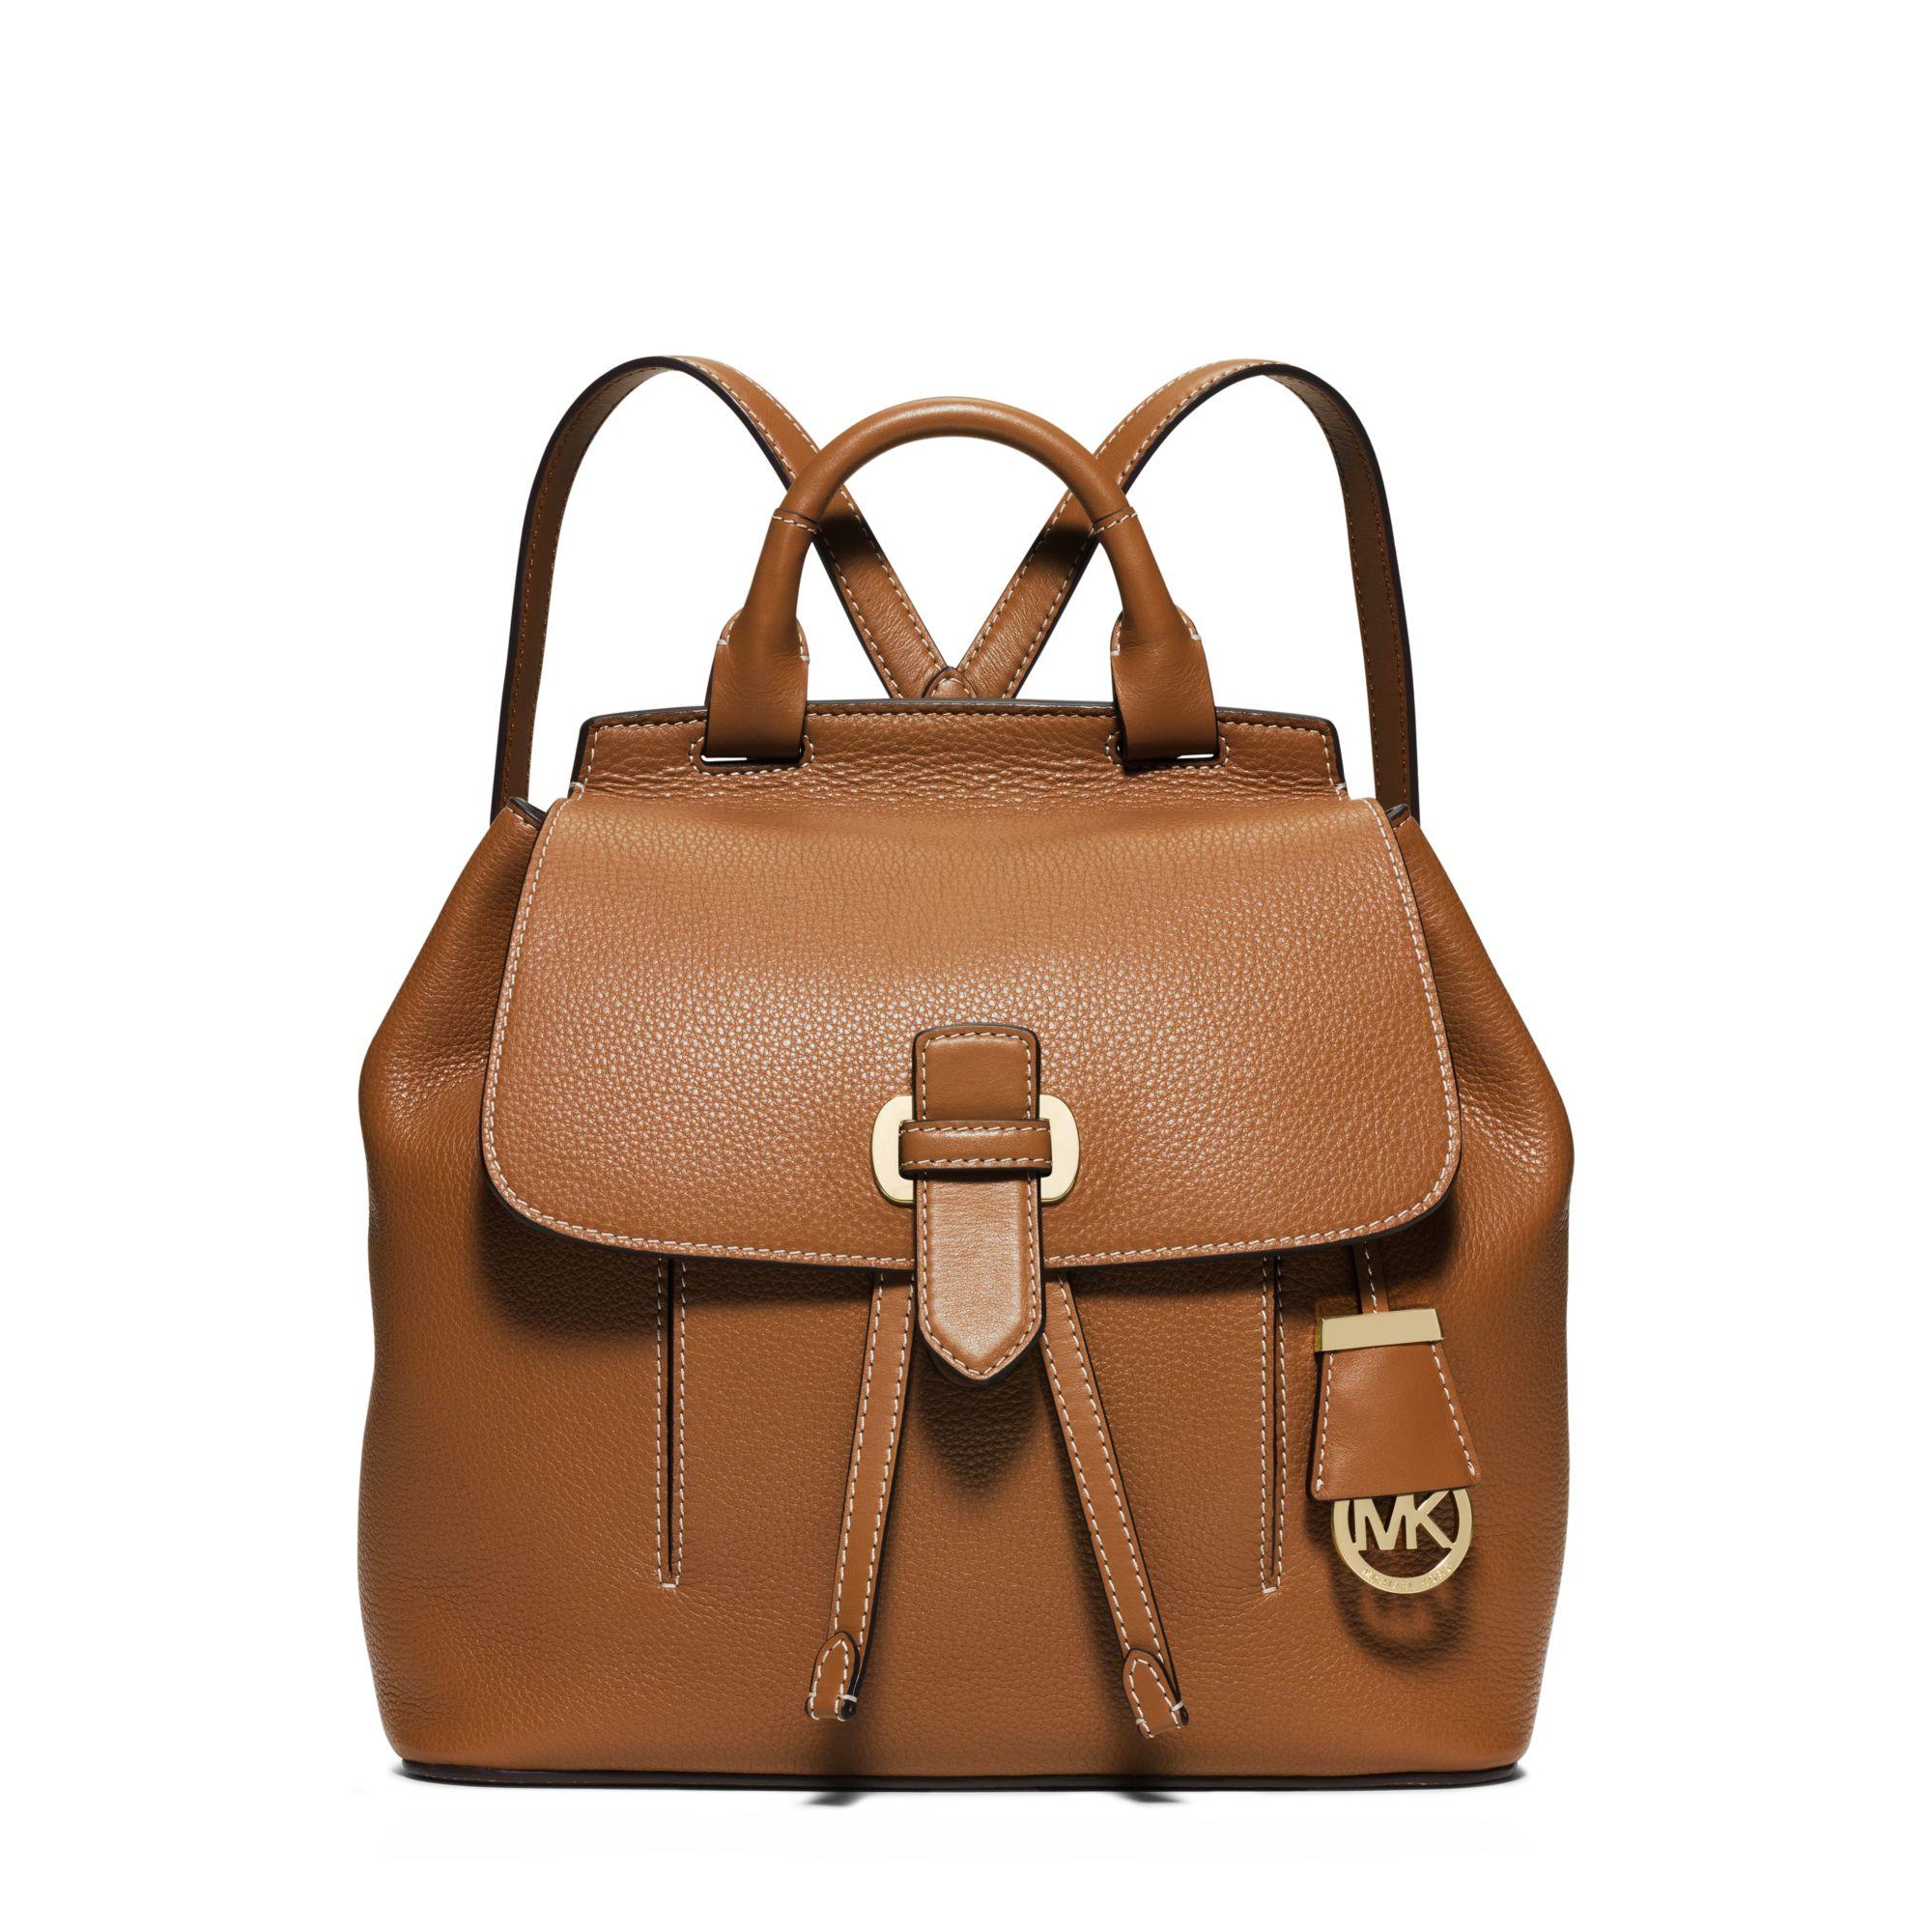 9dfde4e40940 ... buy lyst michael kors romy medium leather backpack in brown 9faf7 fb3aa